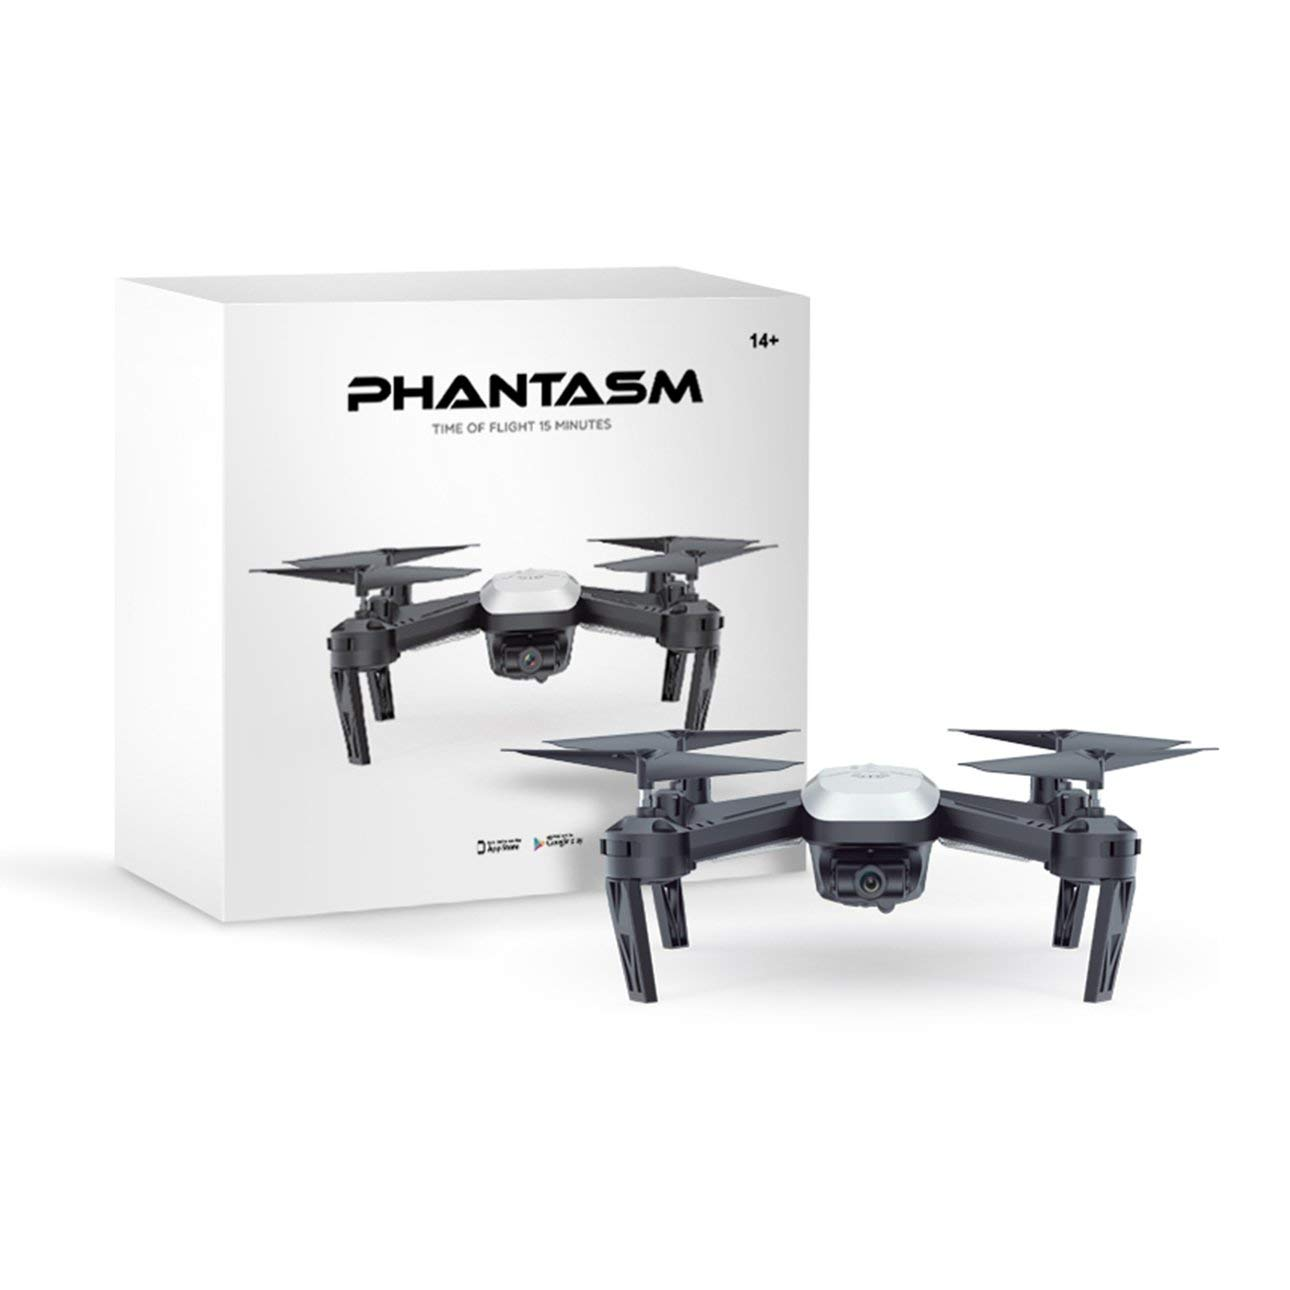 Liobaba SMRC S8 FPV Quadcopter Mini Wi-Fi RC Drone 0.3MP HD Camera Altitude Hold Headless Mode Gravity Sensor Phone APP Control